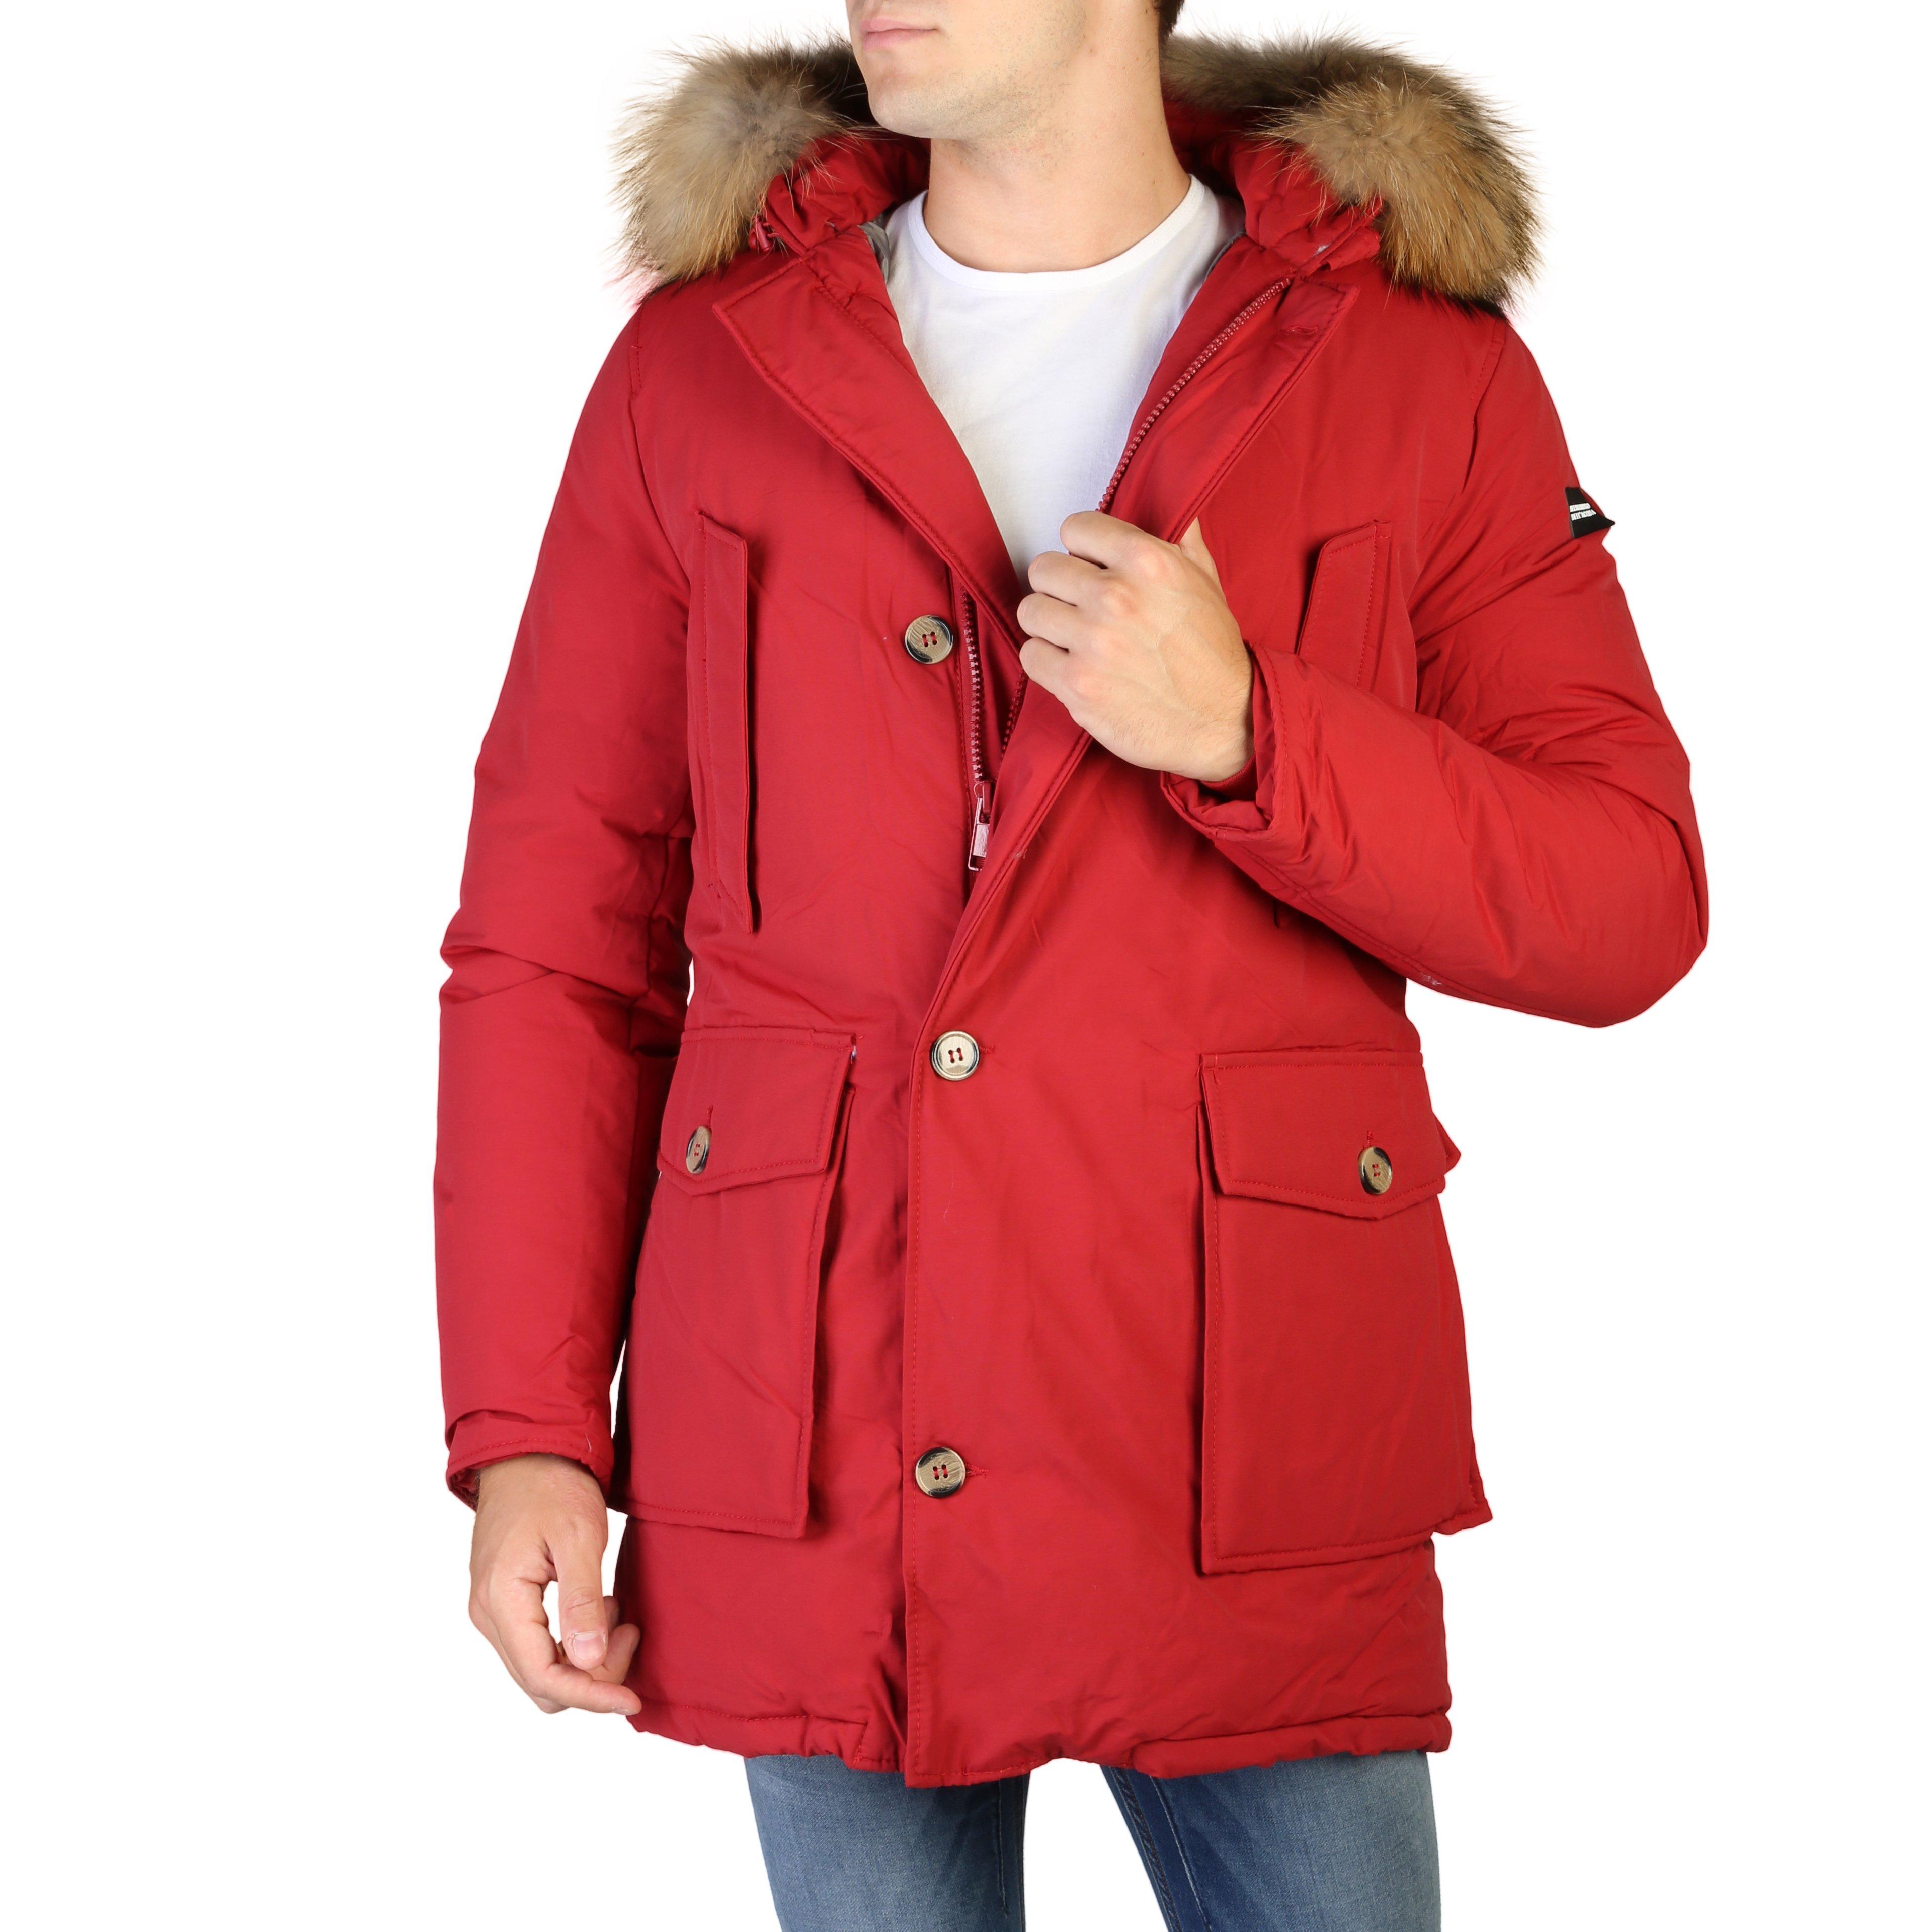 Alessandro Dell'Acqua Men's Jacket Various Colours 348364 - red L